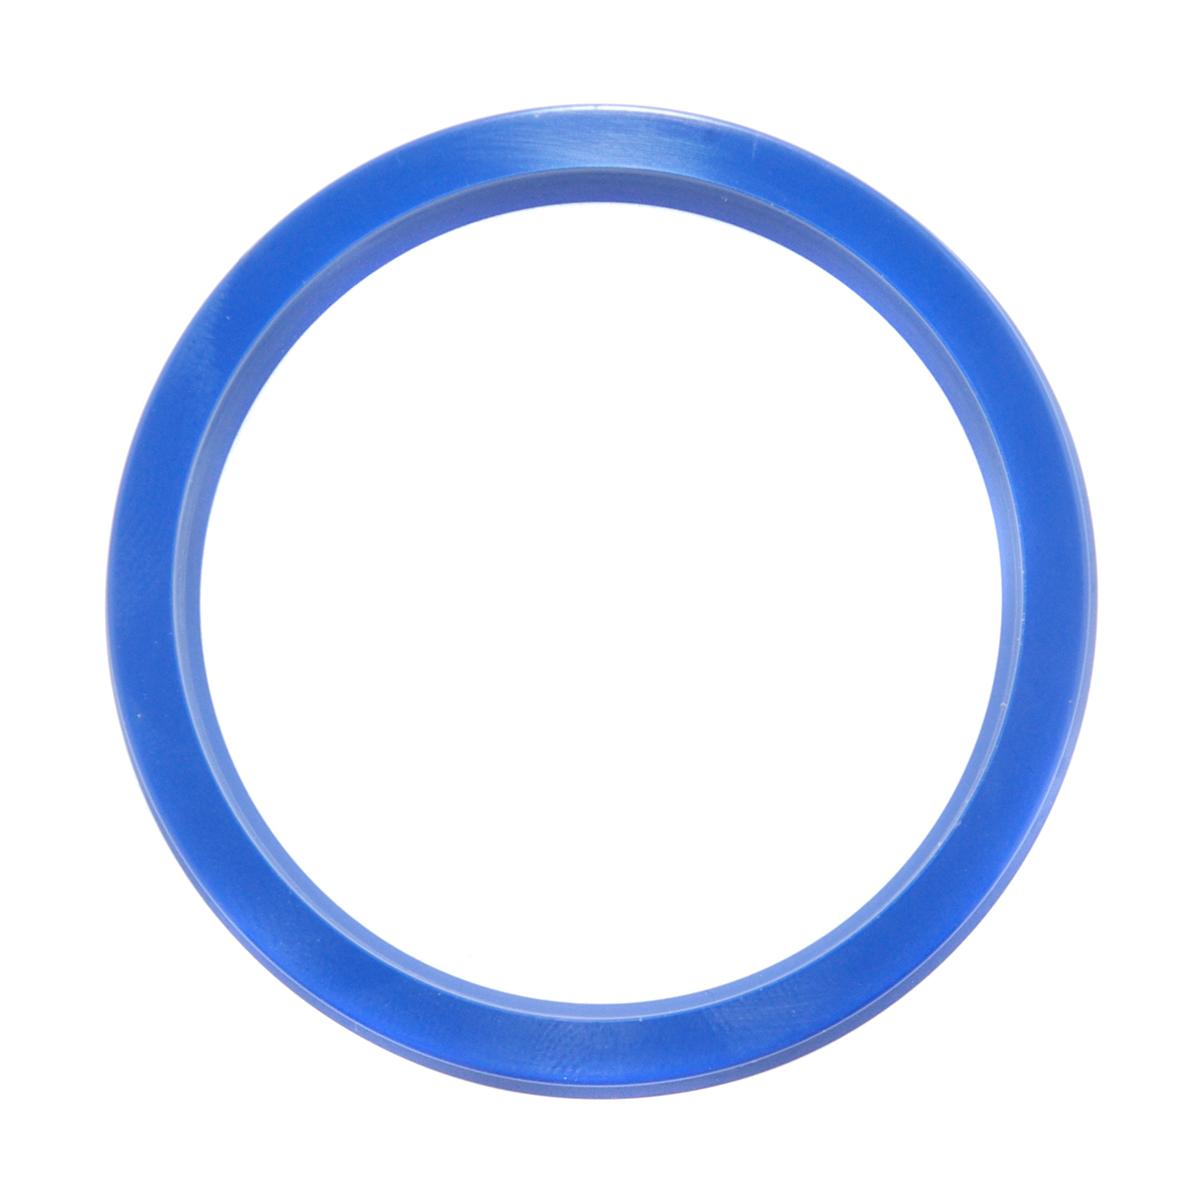 Nutring 4 x 10 x 4 mm aus pu profil np 1 ebay for 10 x 10 x 10